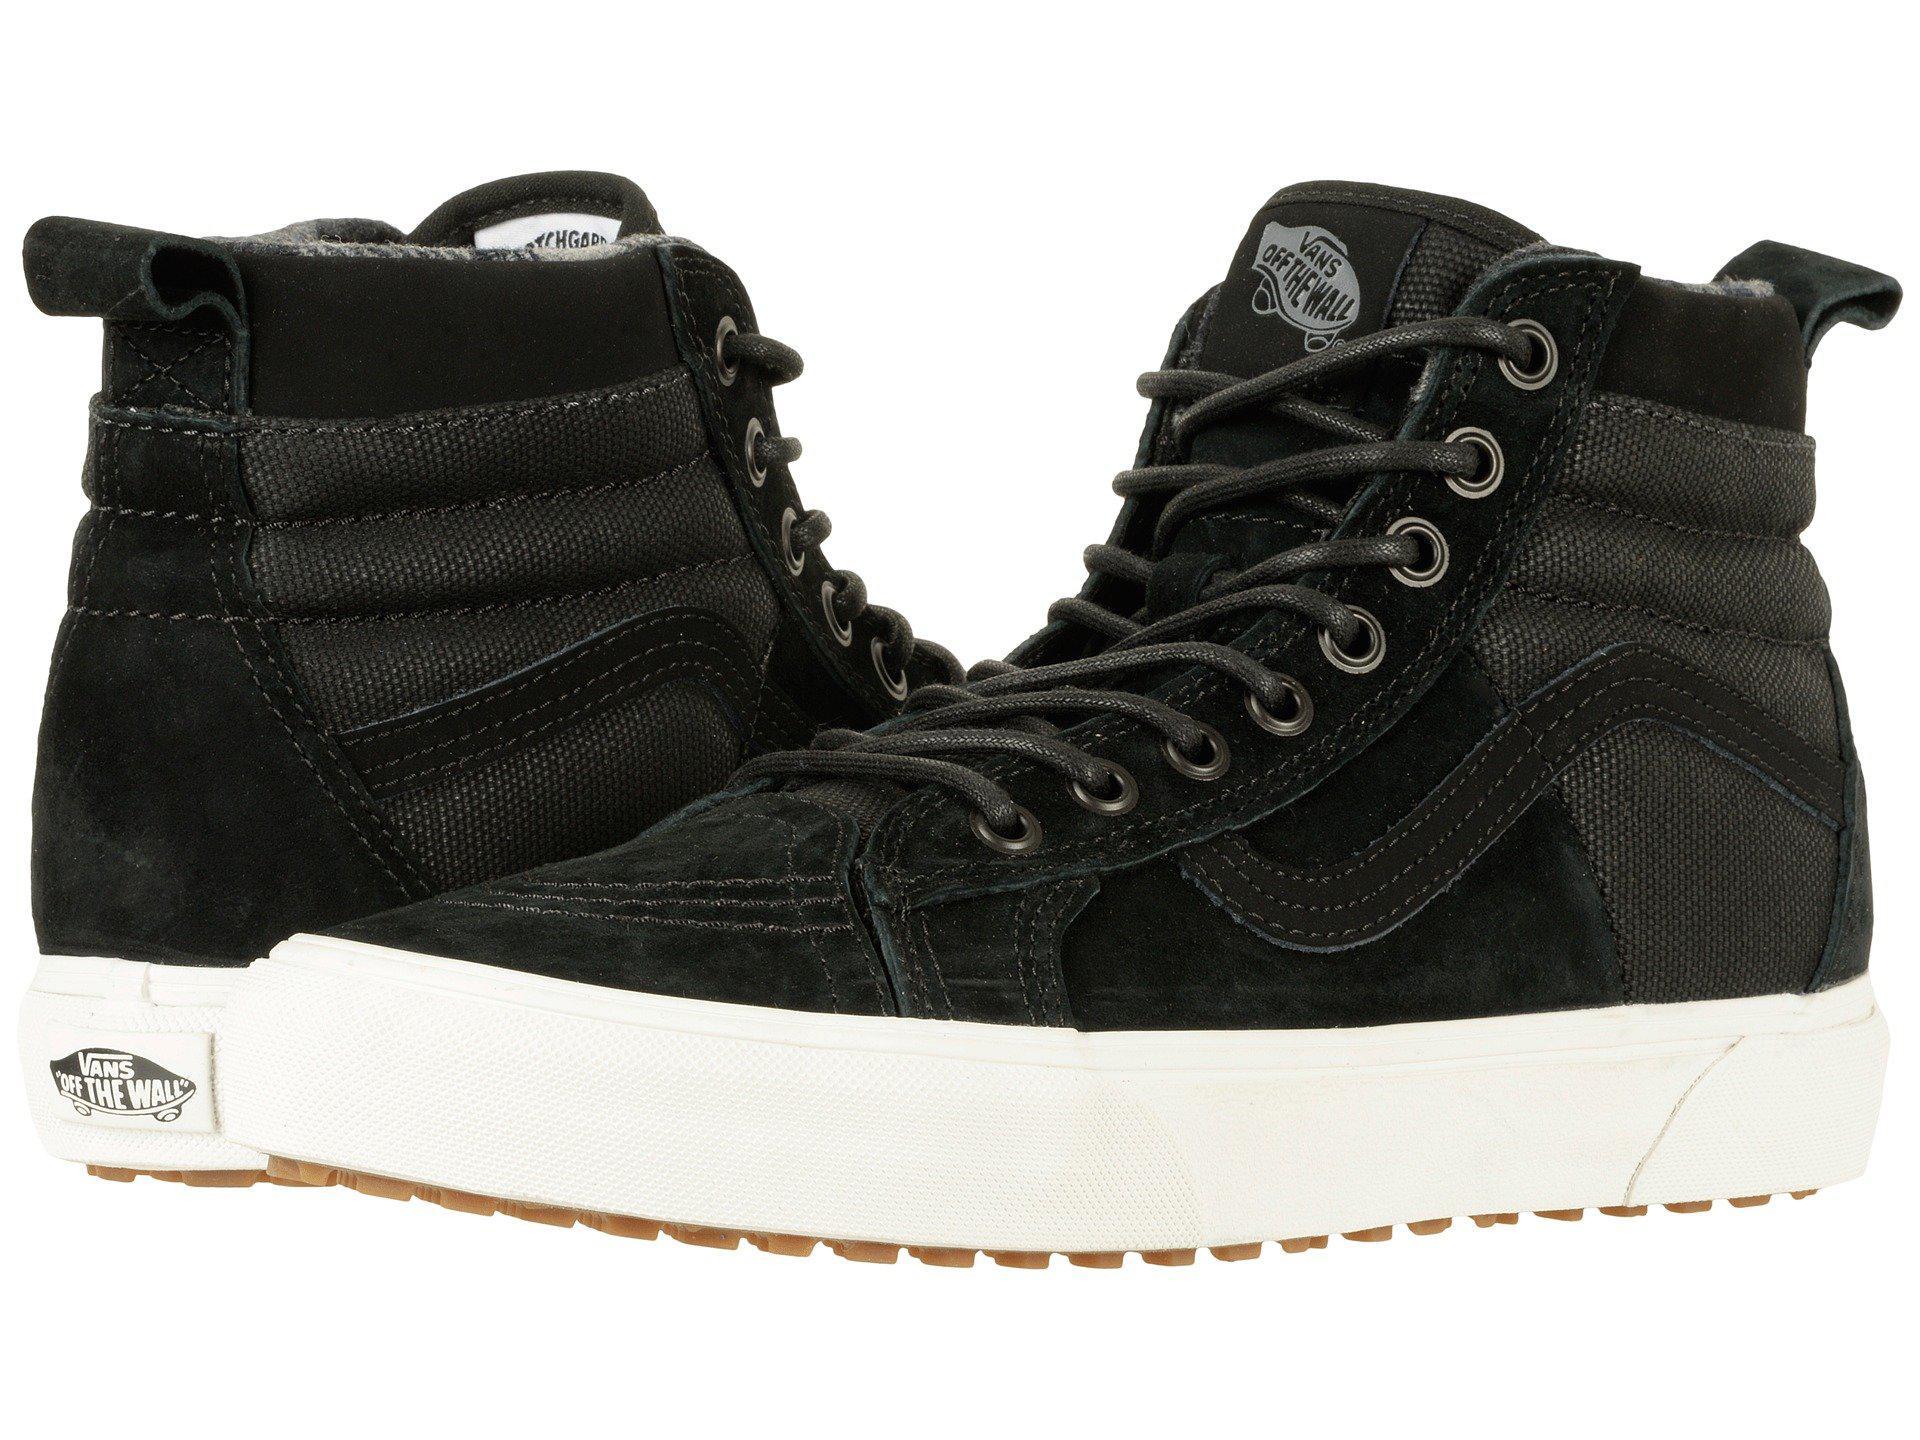 62b584639e Lyst - Vans Sk8-hi 46 Mte Dx ((mte) Tact black) Skate Shoes in Black ...